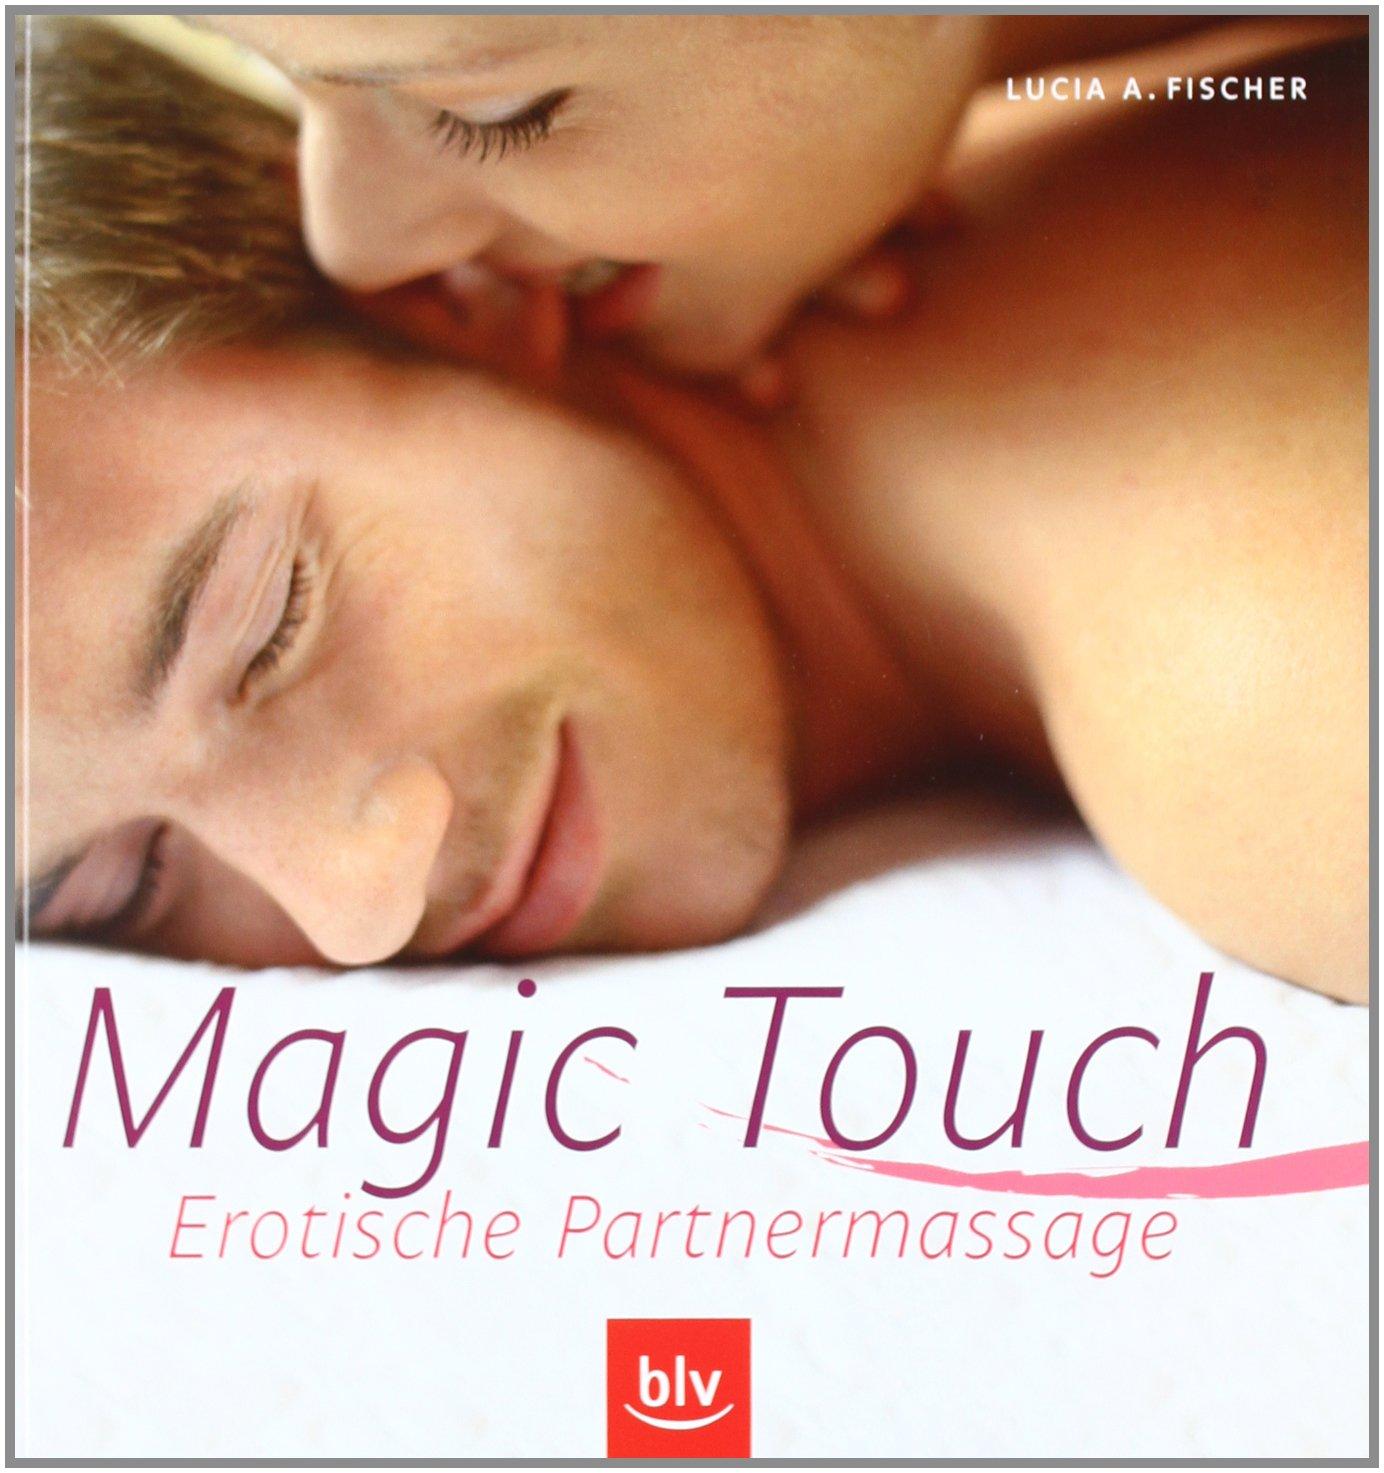 magic-touch-erotische-partnermassage